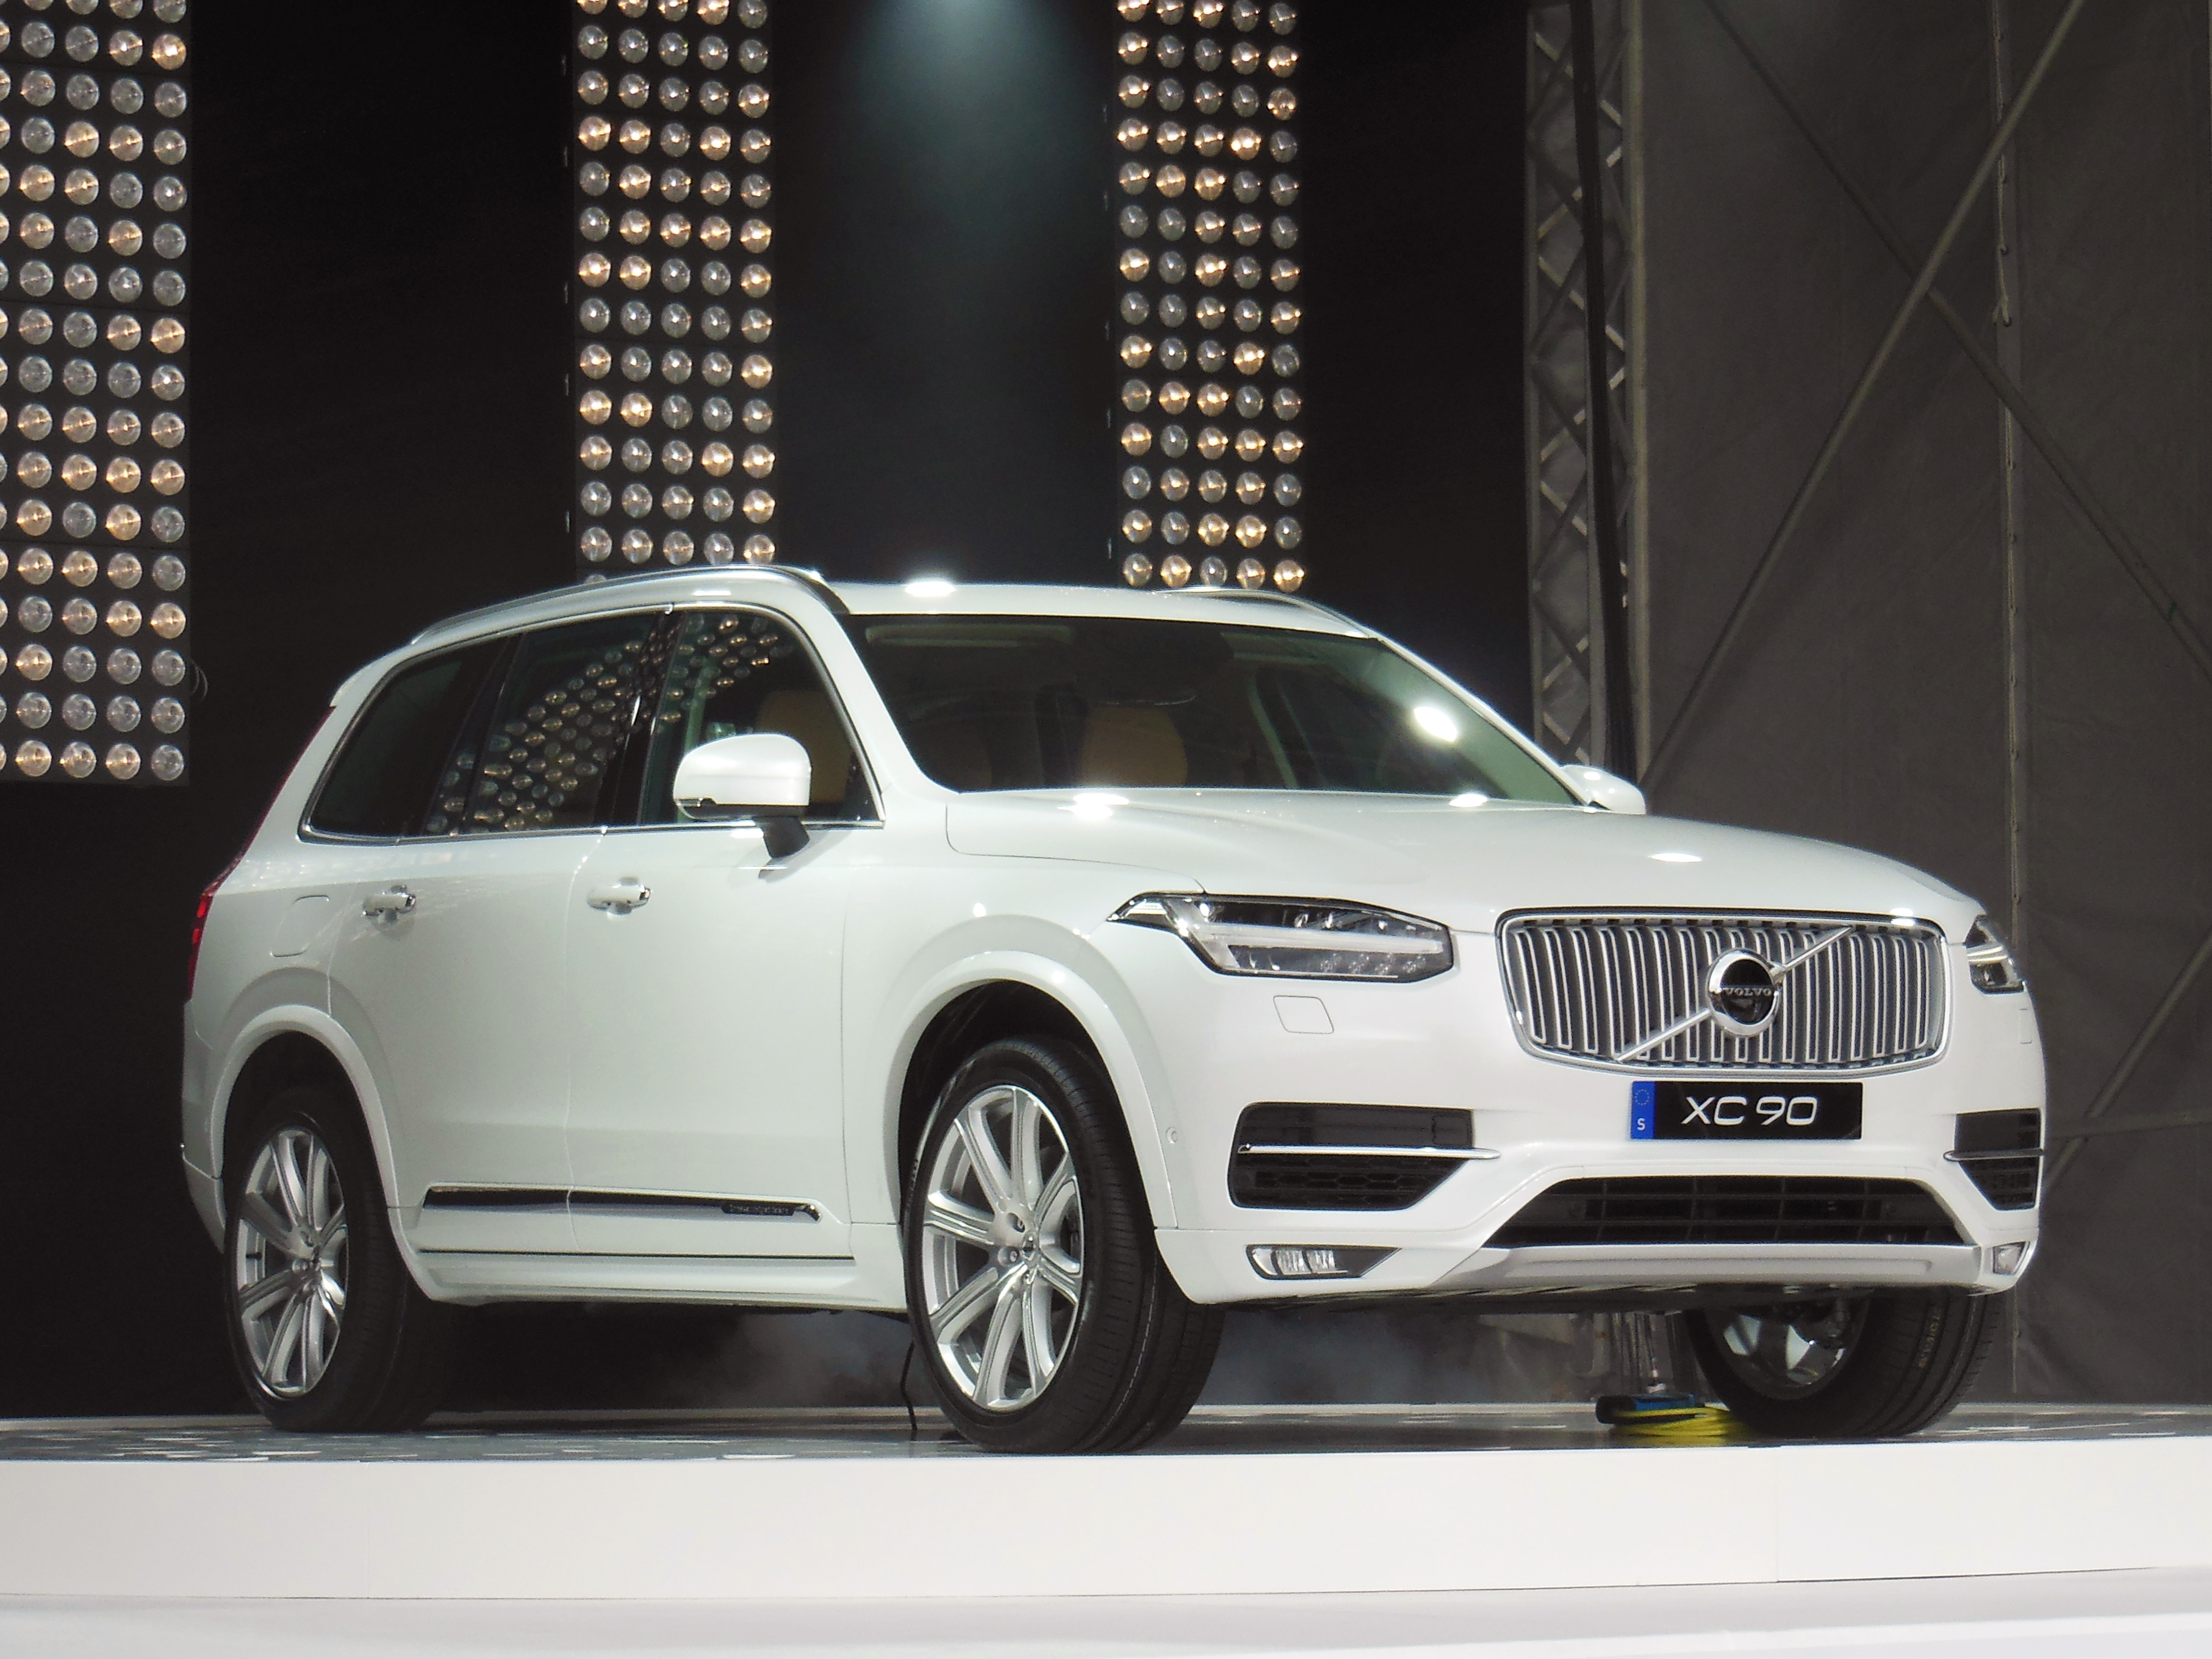 Xc >> File:Volvo XC90 II, August 2014, 01.jpg - Wikimedia Commons